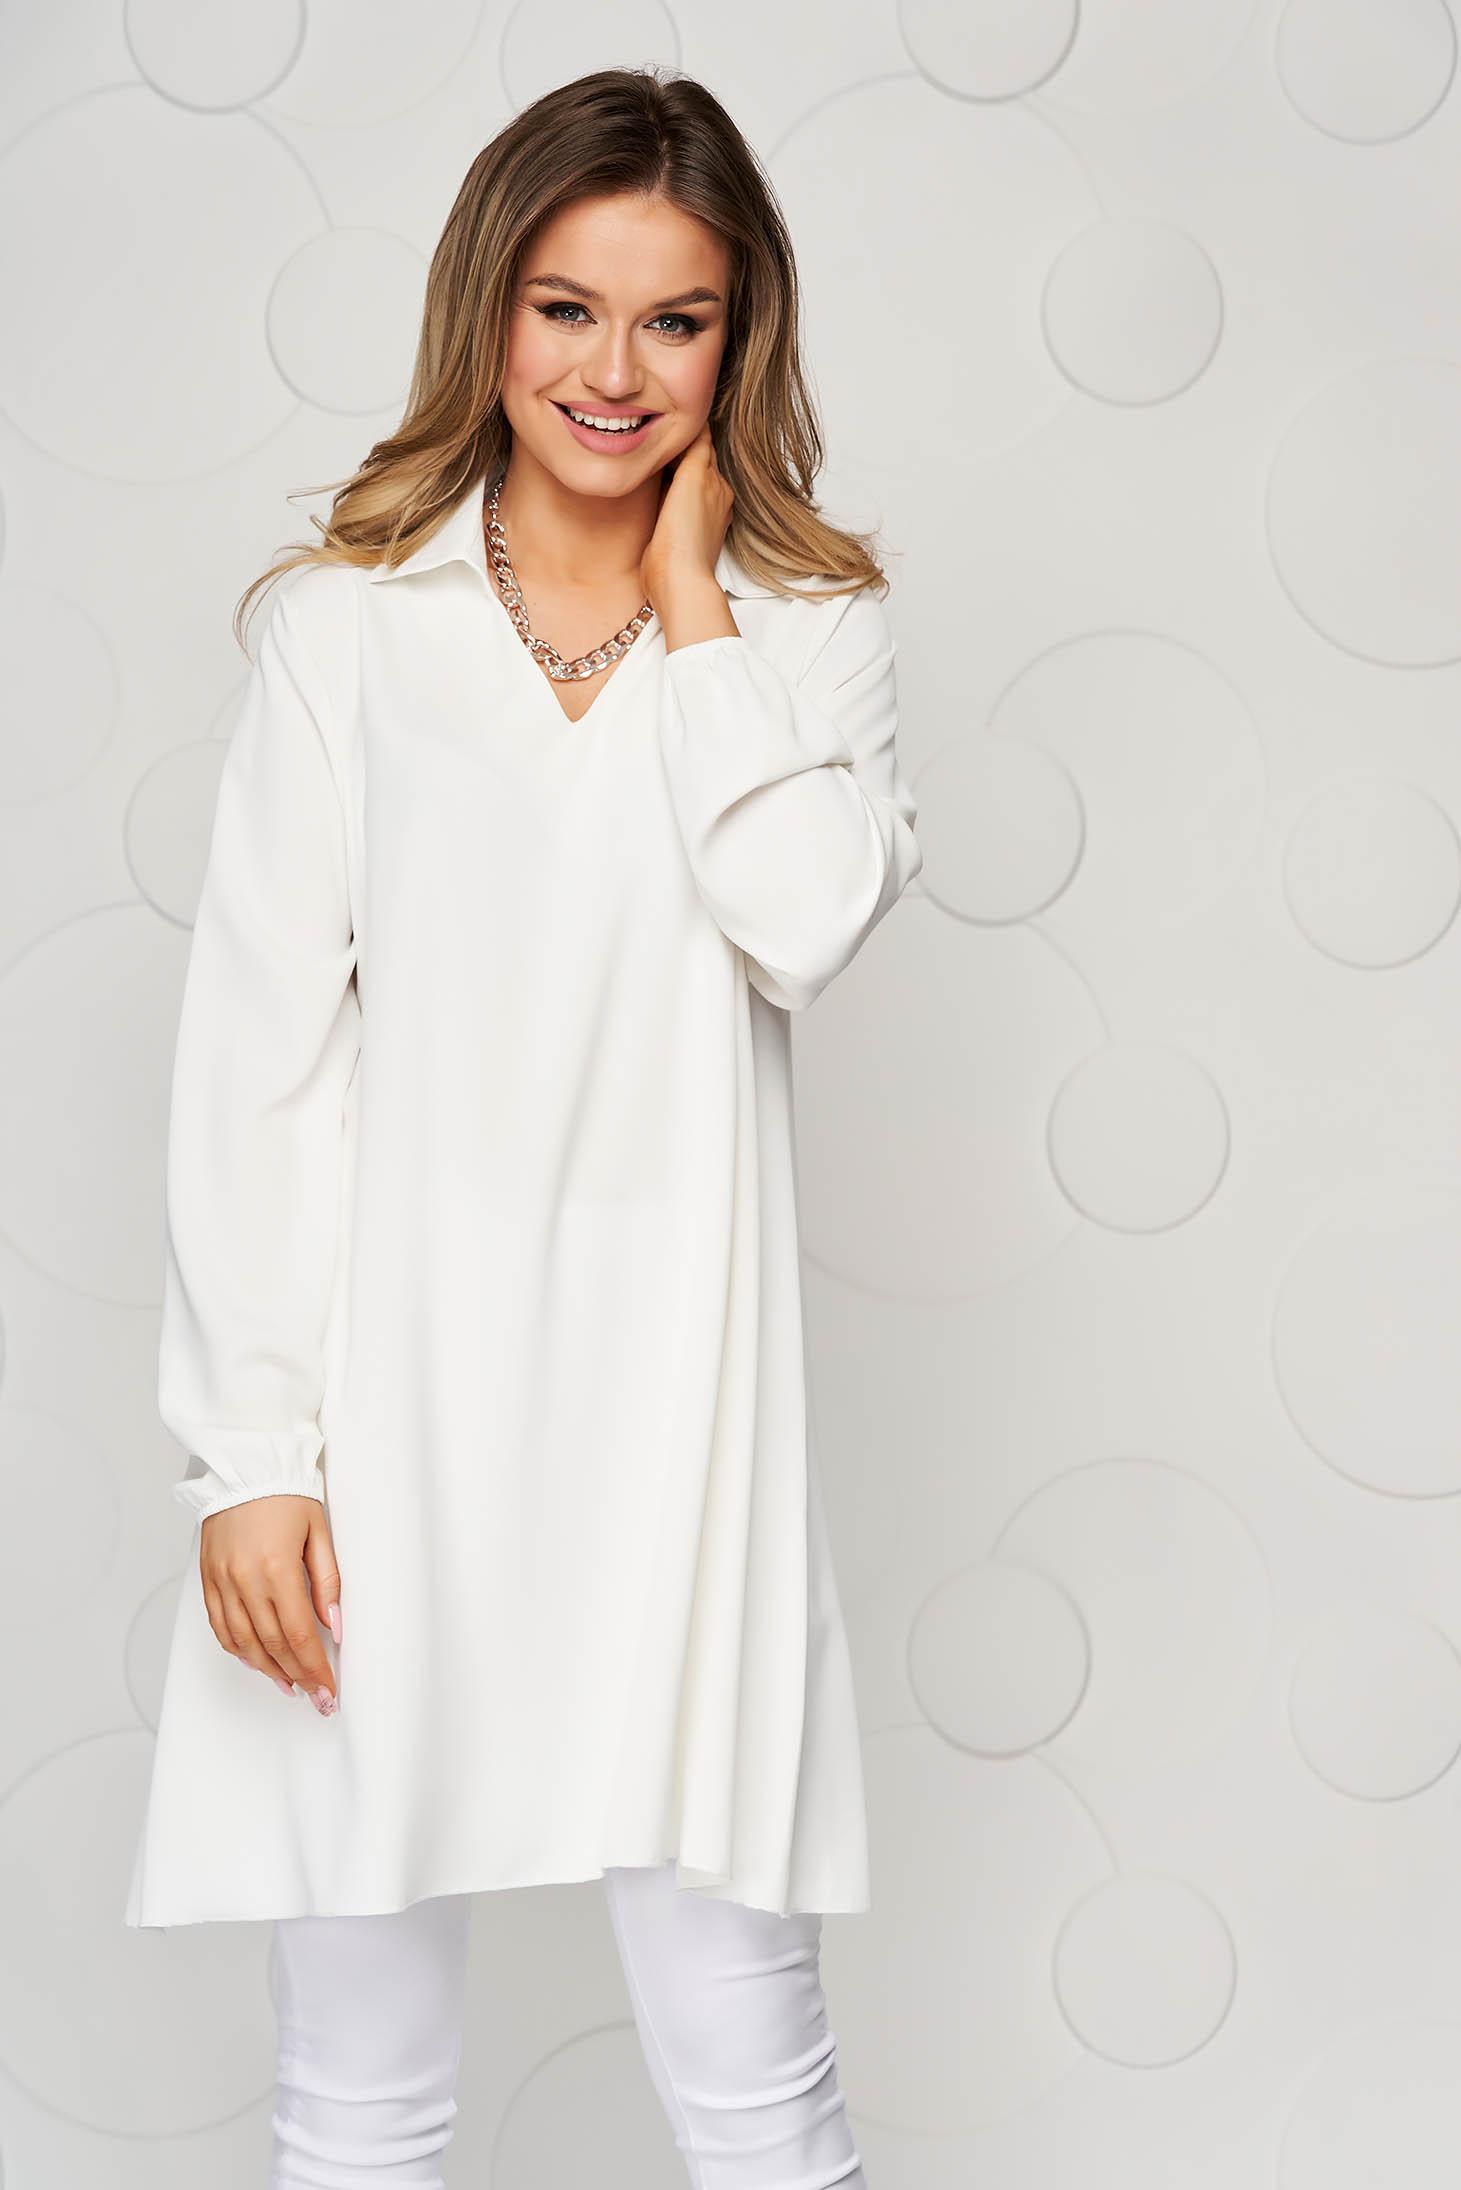 White women`s blouse loose fit transparent chiffon fabric long sleeve